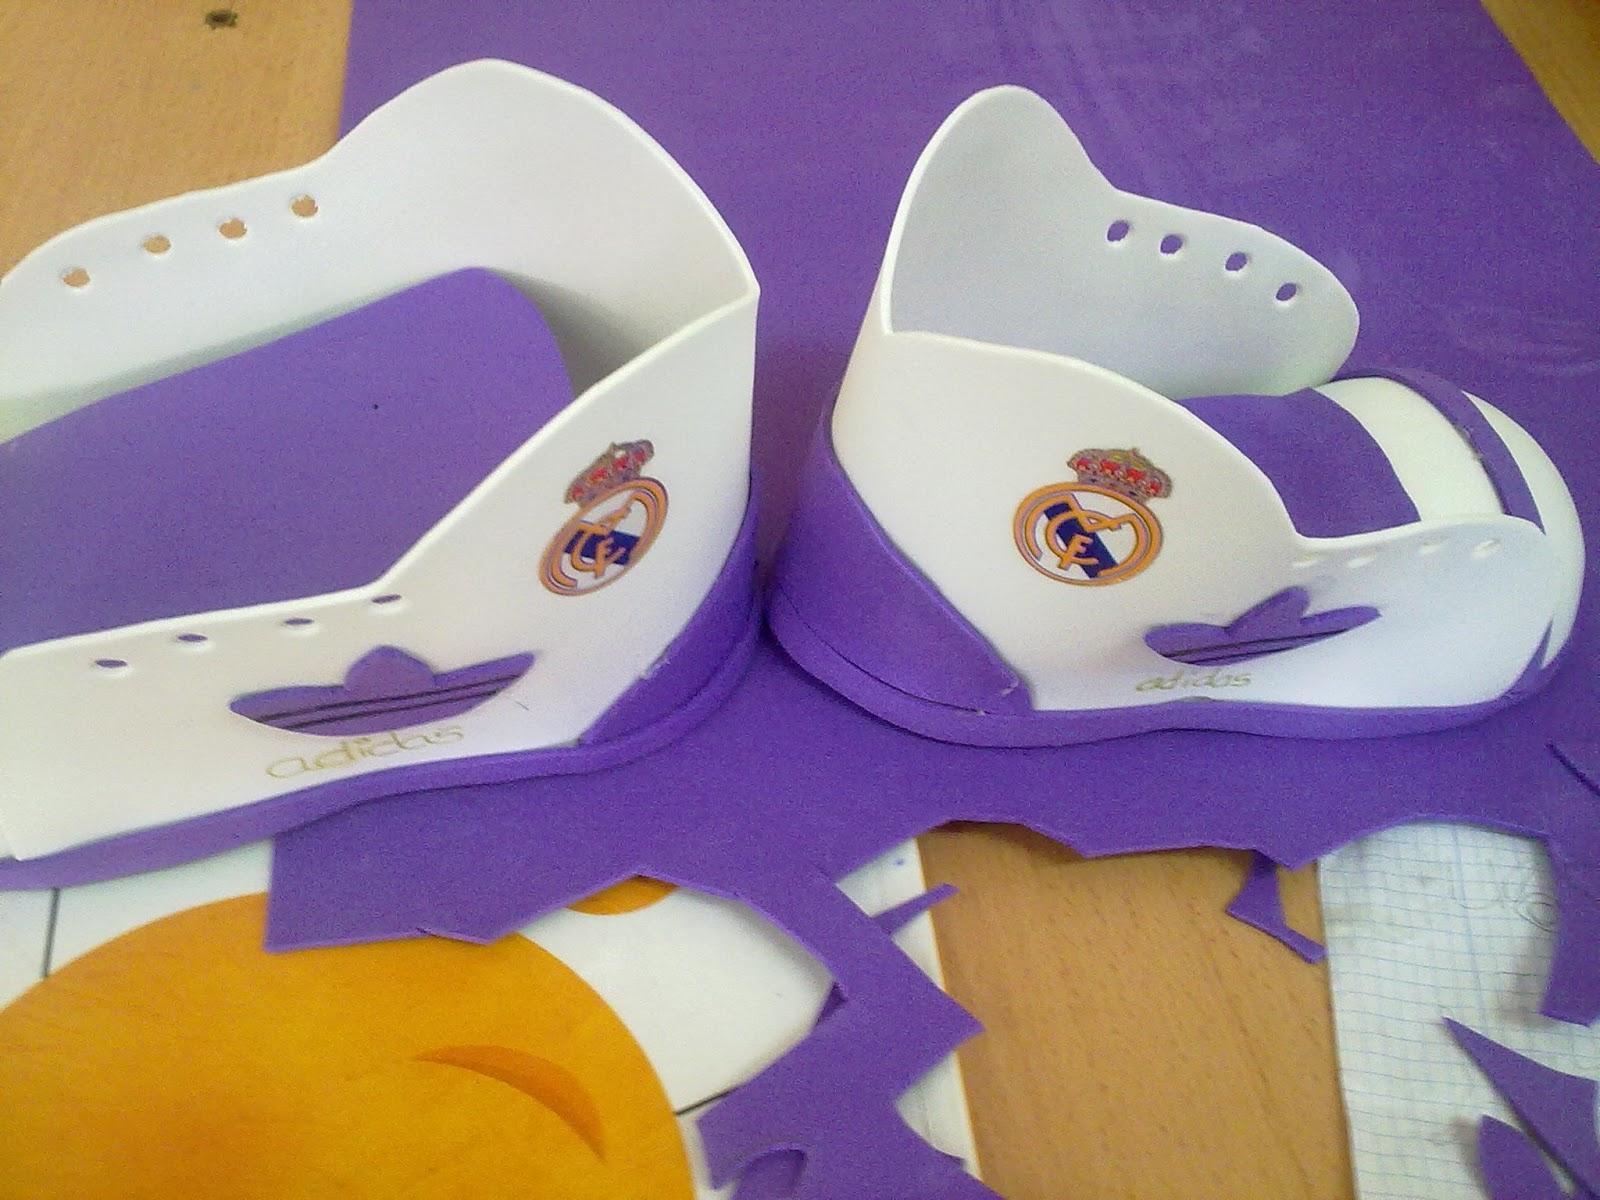 Manualidades botas de goma eva - Manualidades de goma eva ...